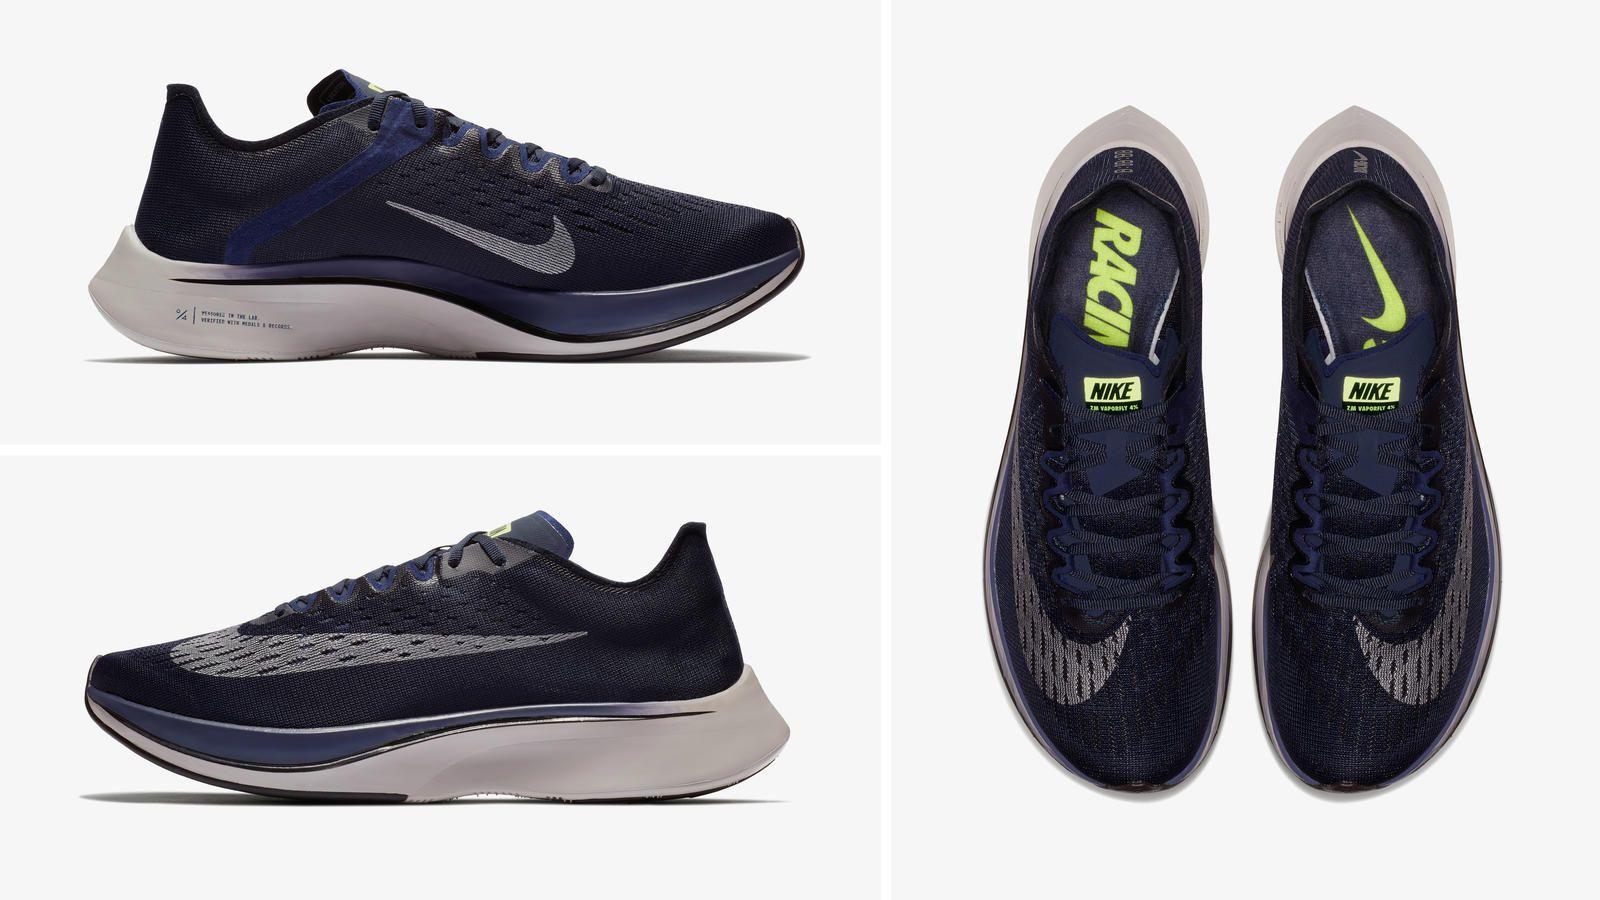 27d5b4de8e140 How to Get the Nike Zoom Vaporfly 4%